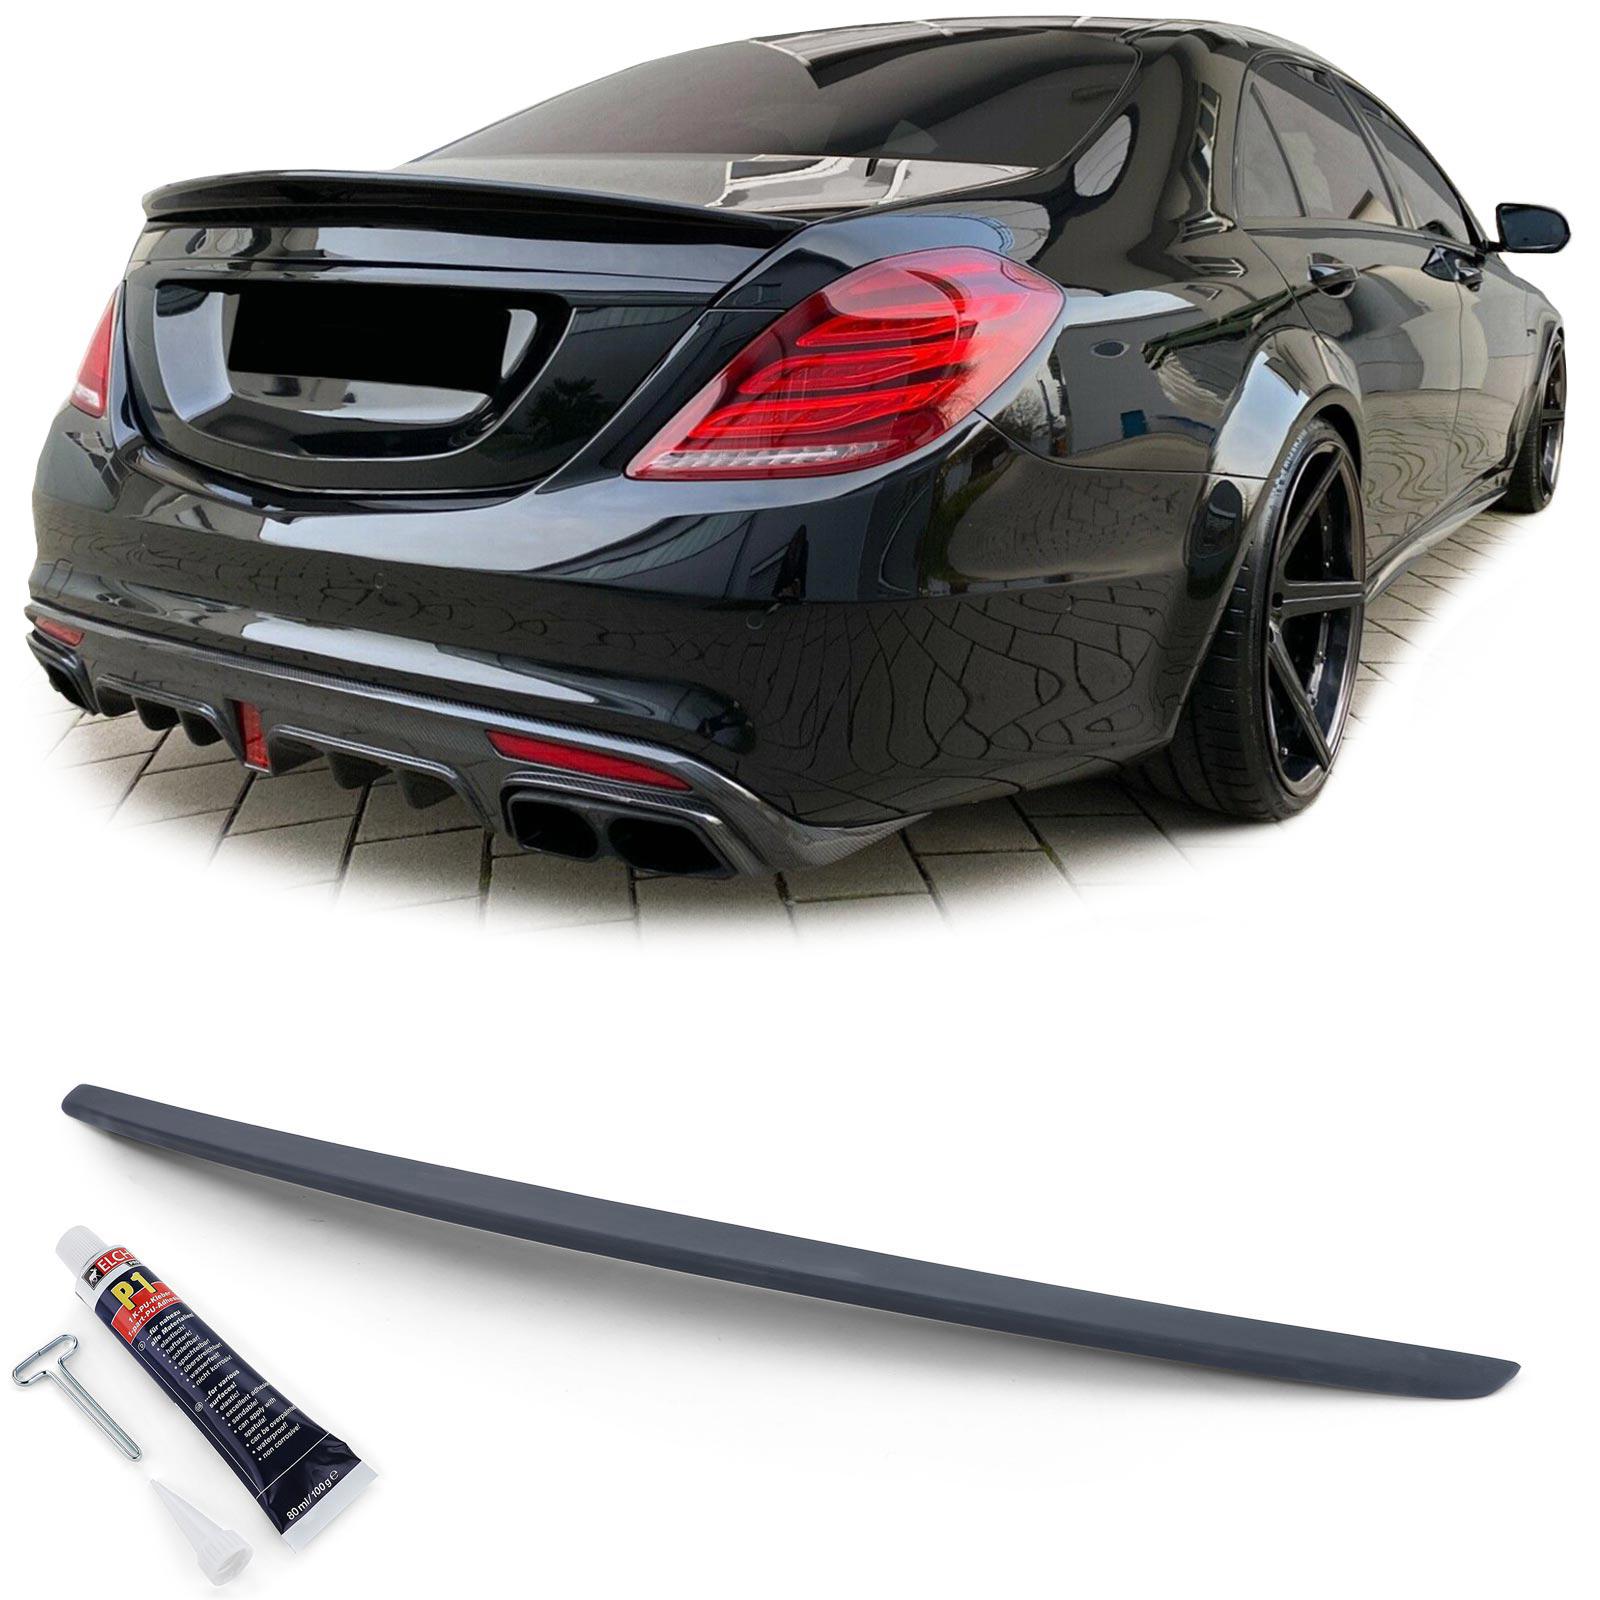 Heckspoiler Spoilerlippe Sport Optik für Mercedes S Klasse W222 ab 13